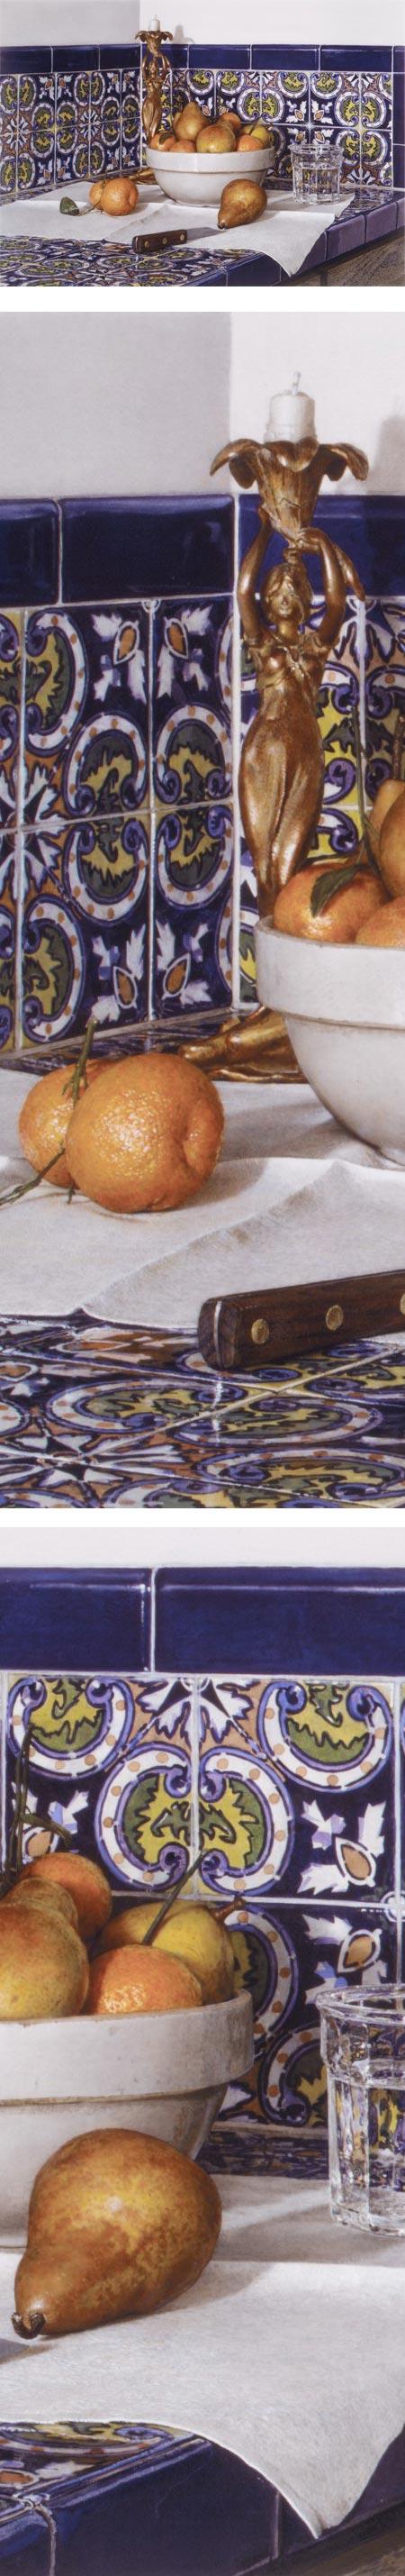 Still Life with Brass Candlestick, John Stuart Ingle